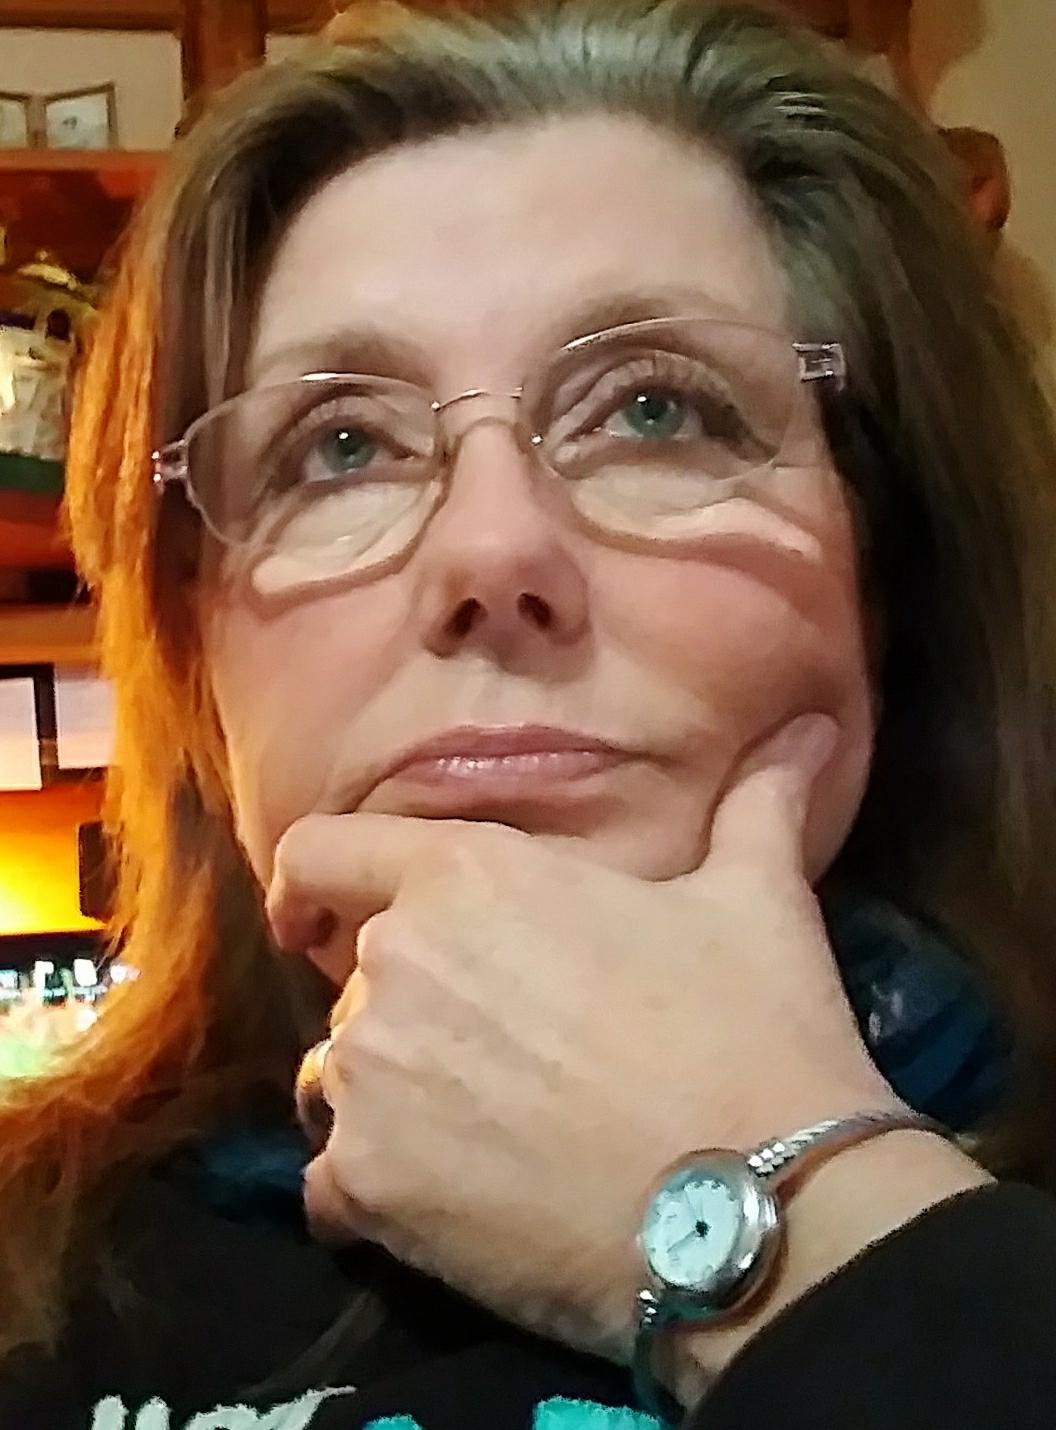 Janna pondering